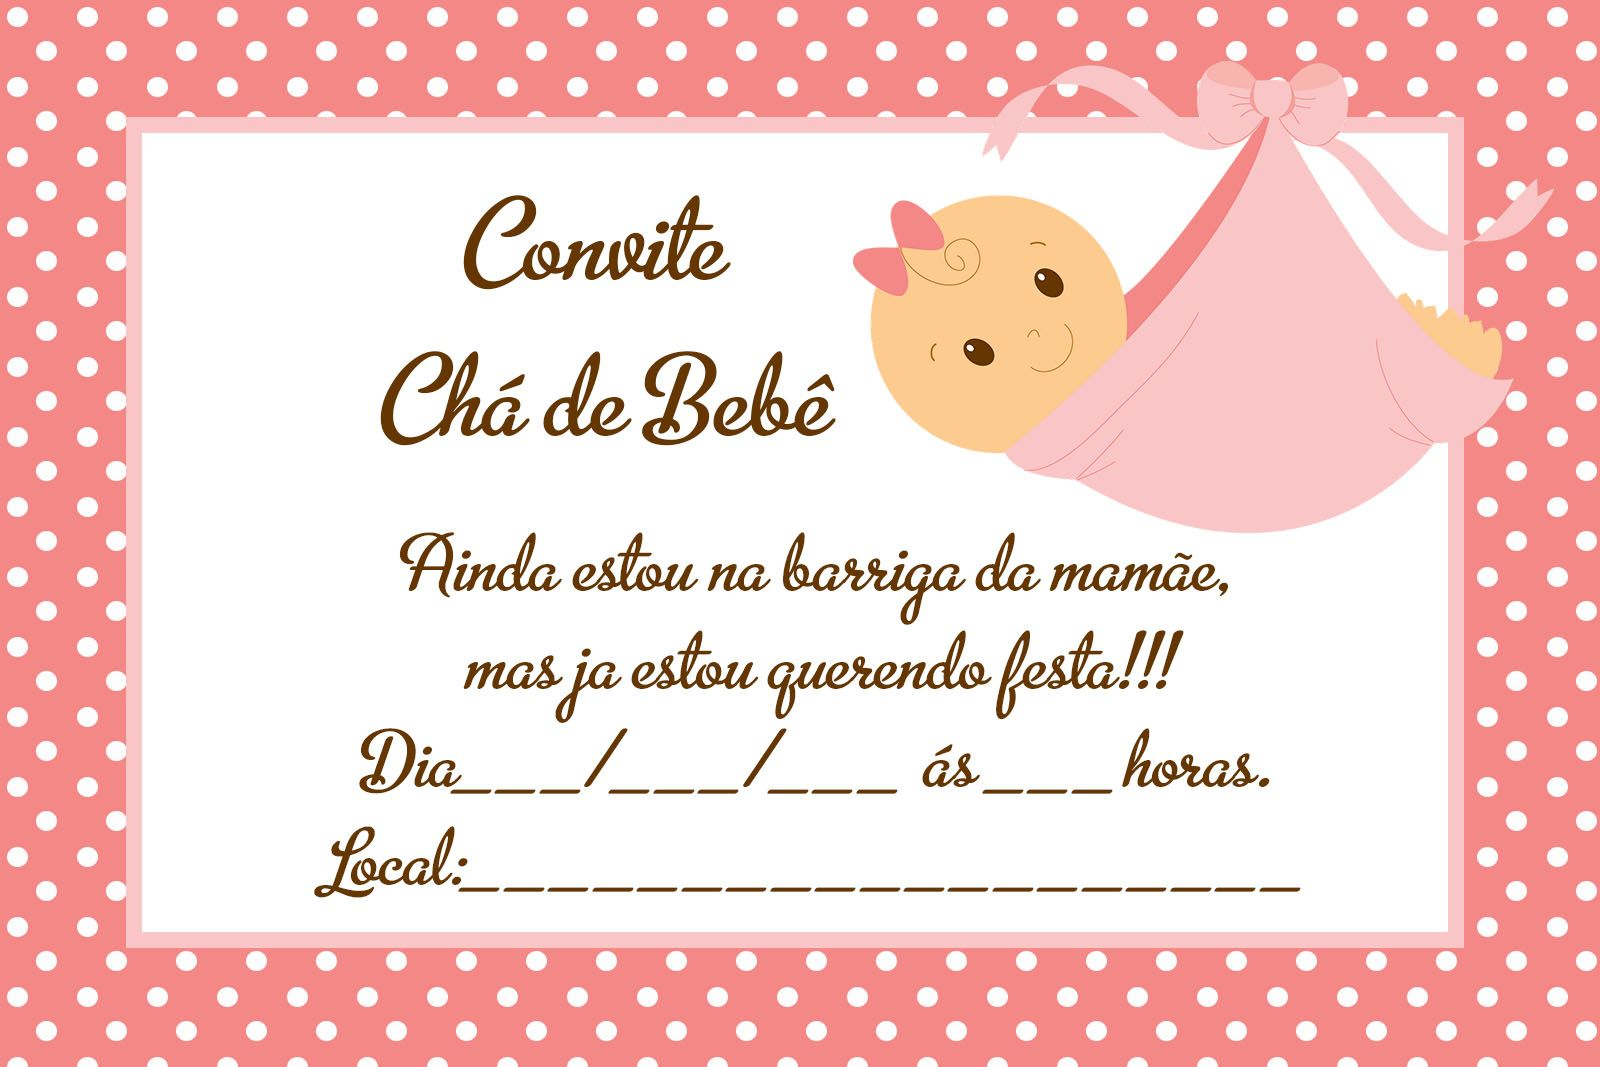 cartao de agradecimento de cha de bebe para imprimir